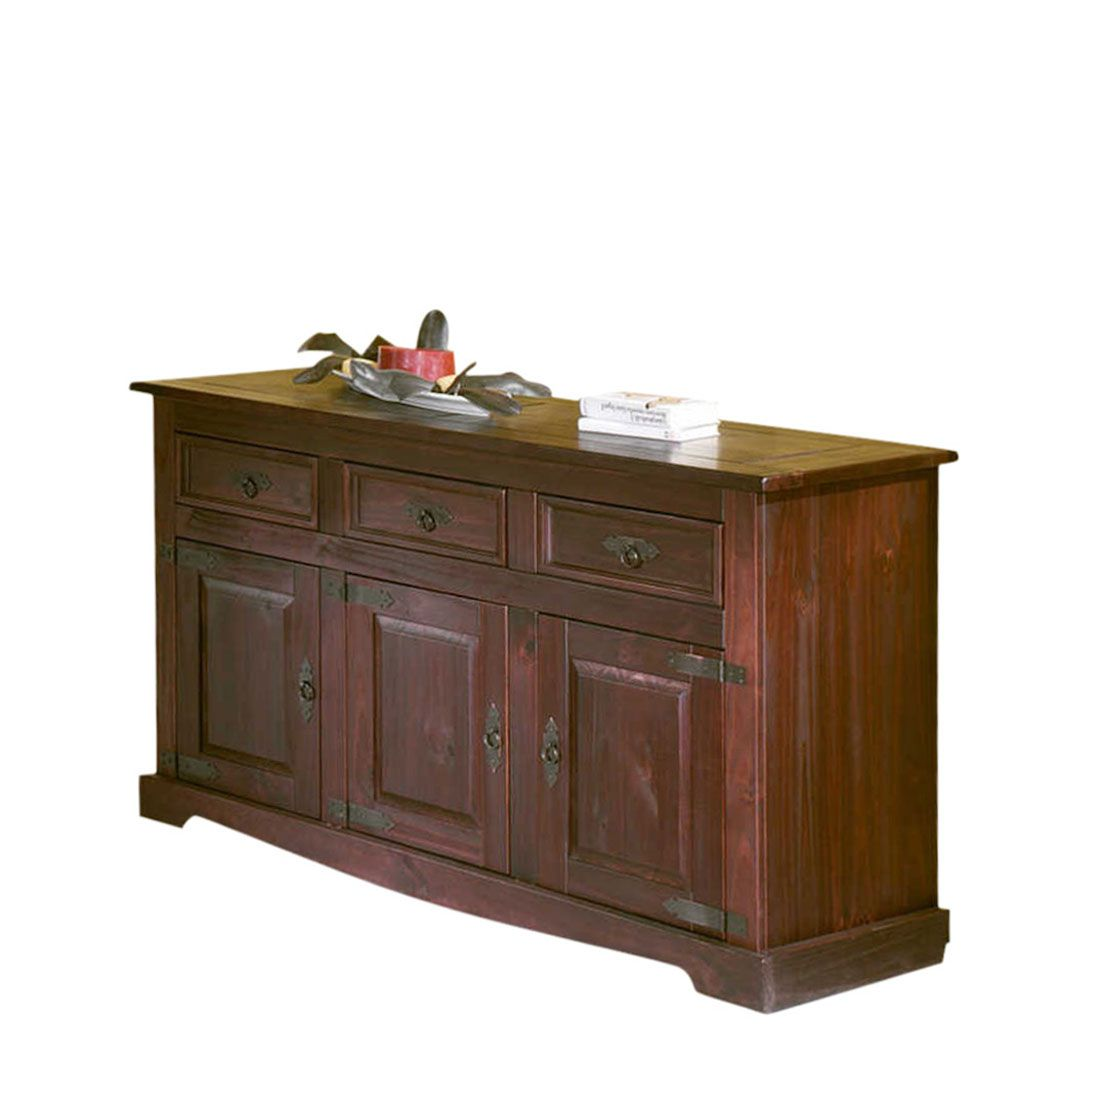 Sideboard san carlos iii massivholz kiefer kolonial for Sideboard massivholz